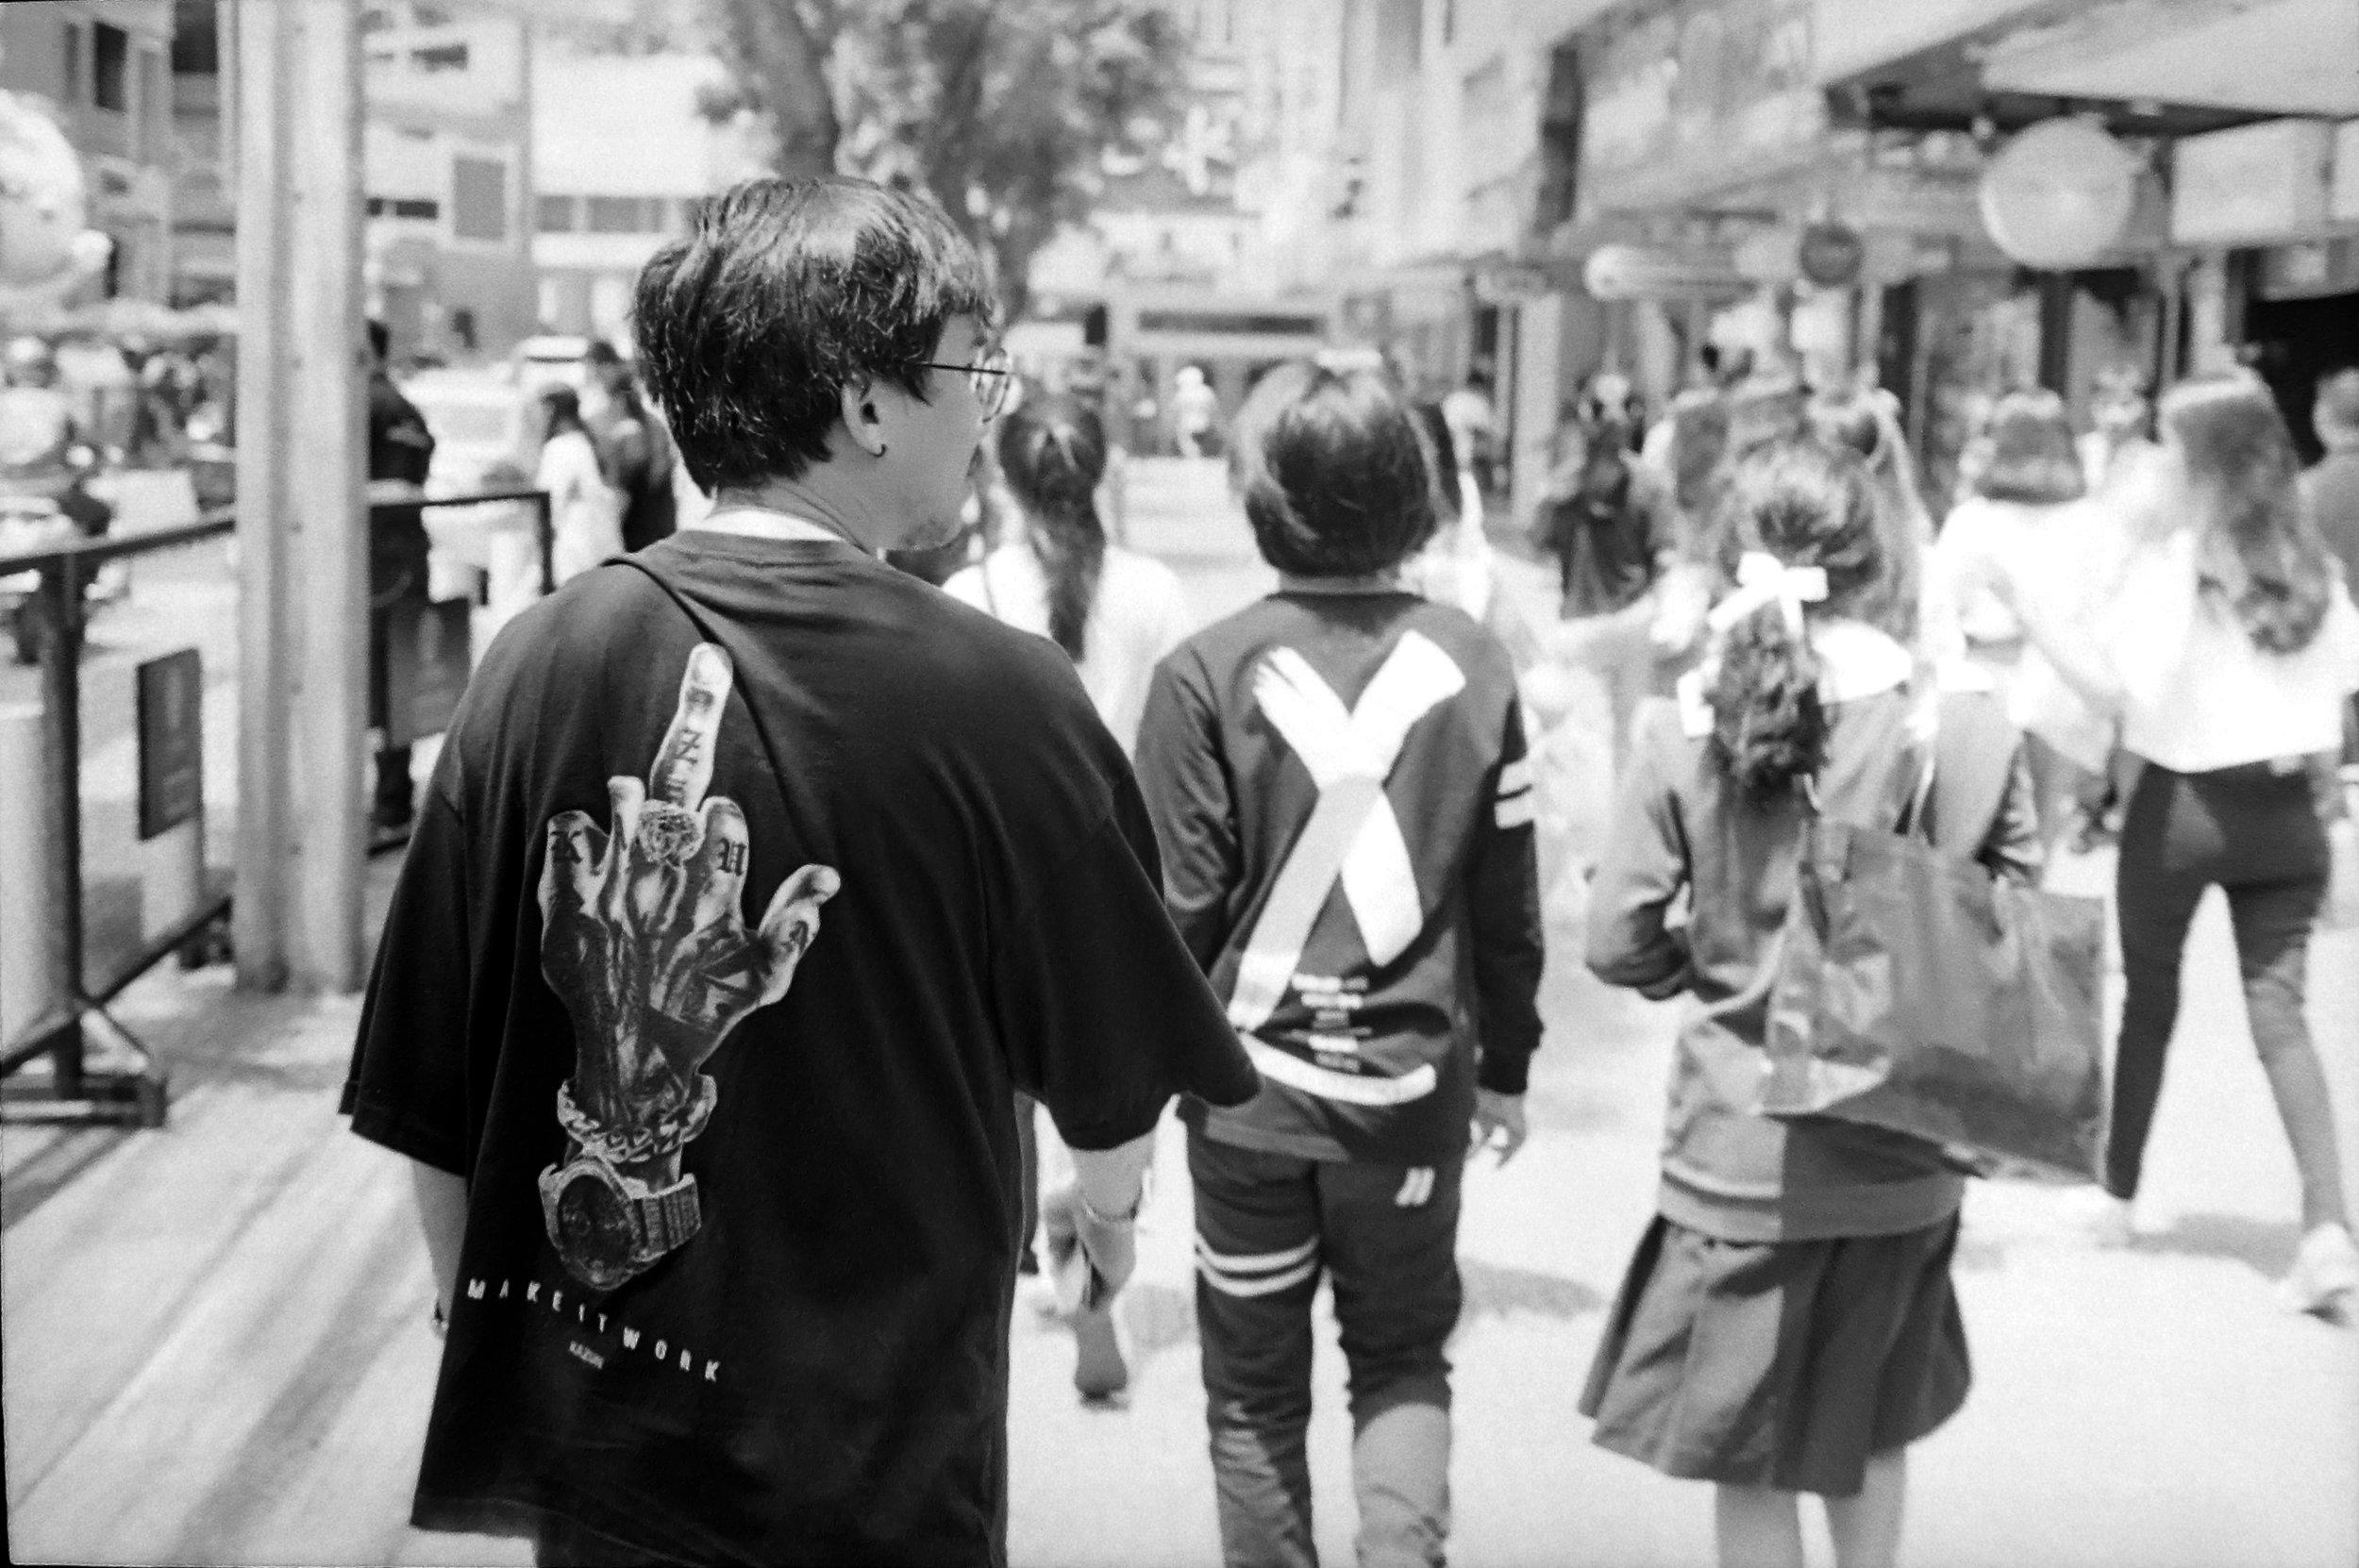 chromacomaphoto street photography bangkok thailand film tri x summicron rigid 50 leica m4 black and white (13).JPG